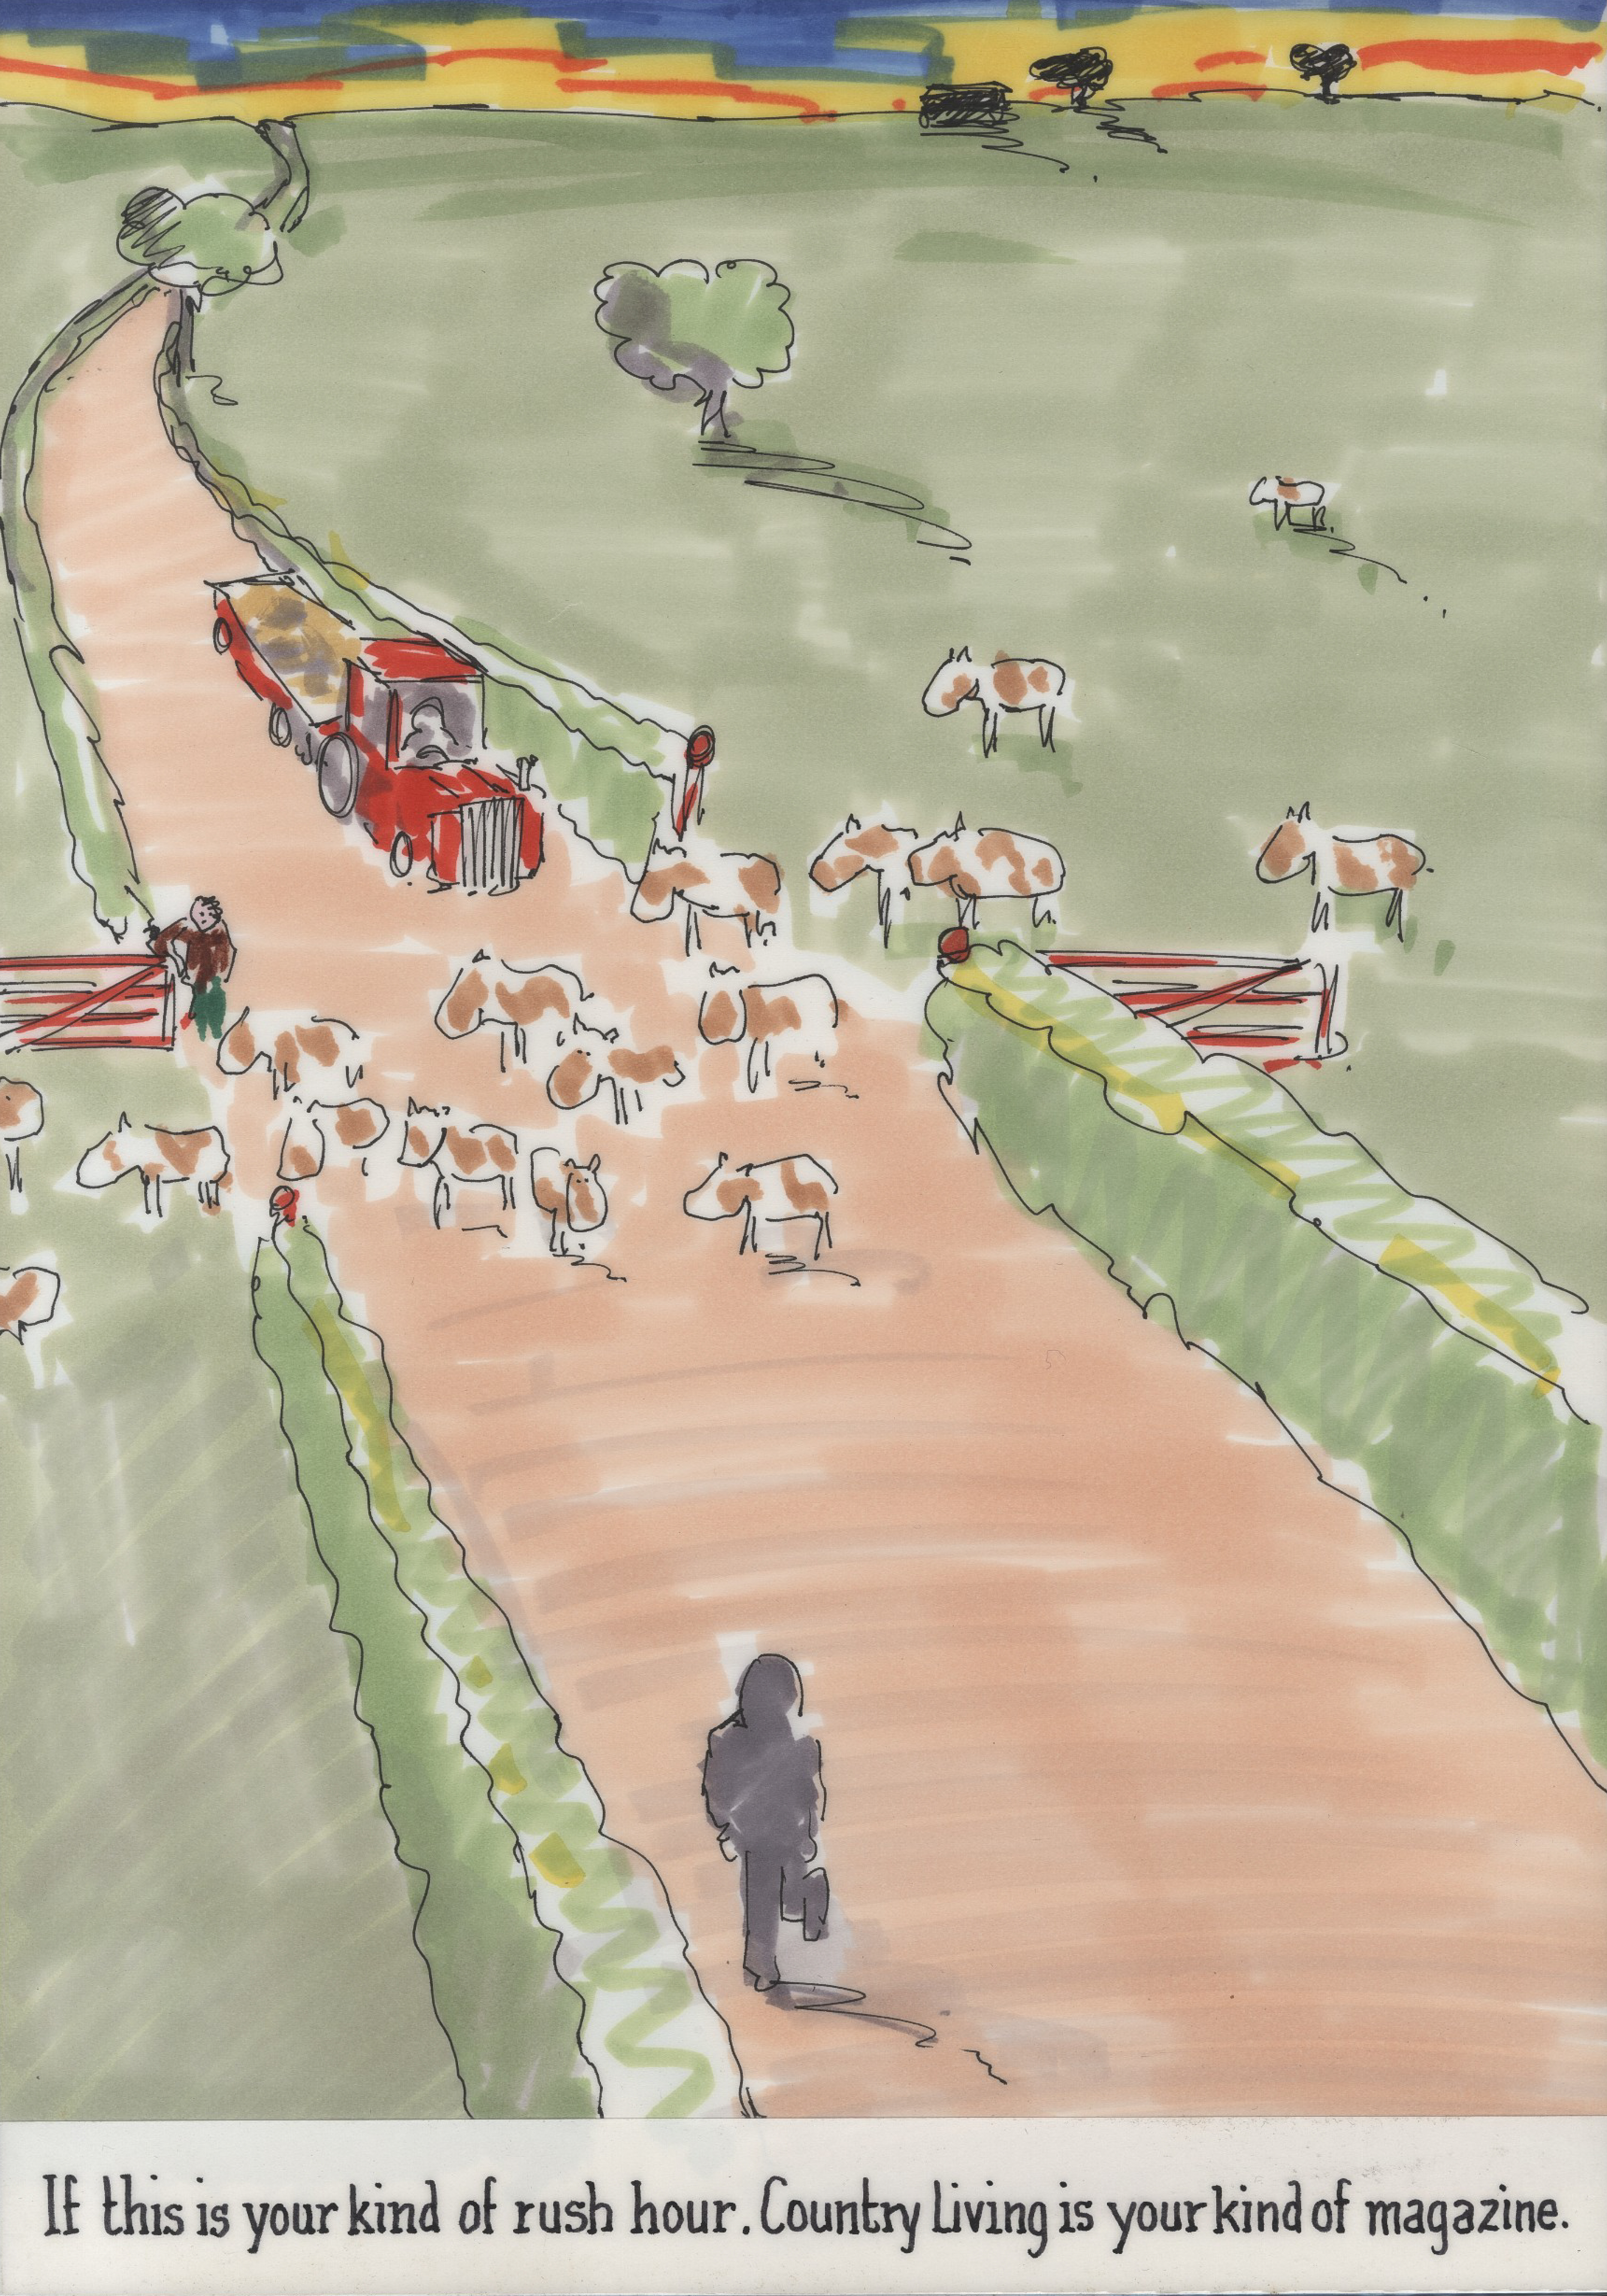 Country Living 'Rush Hour' Rough-01